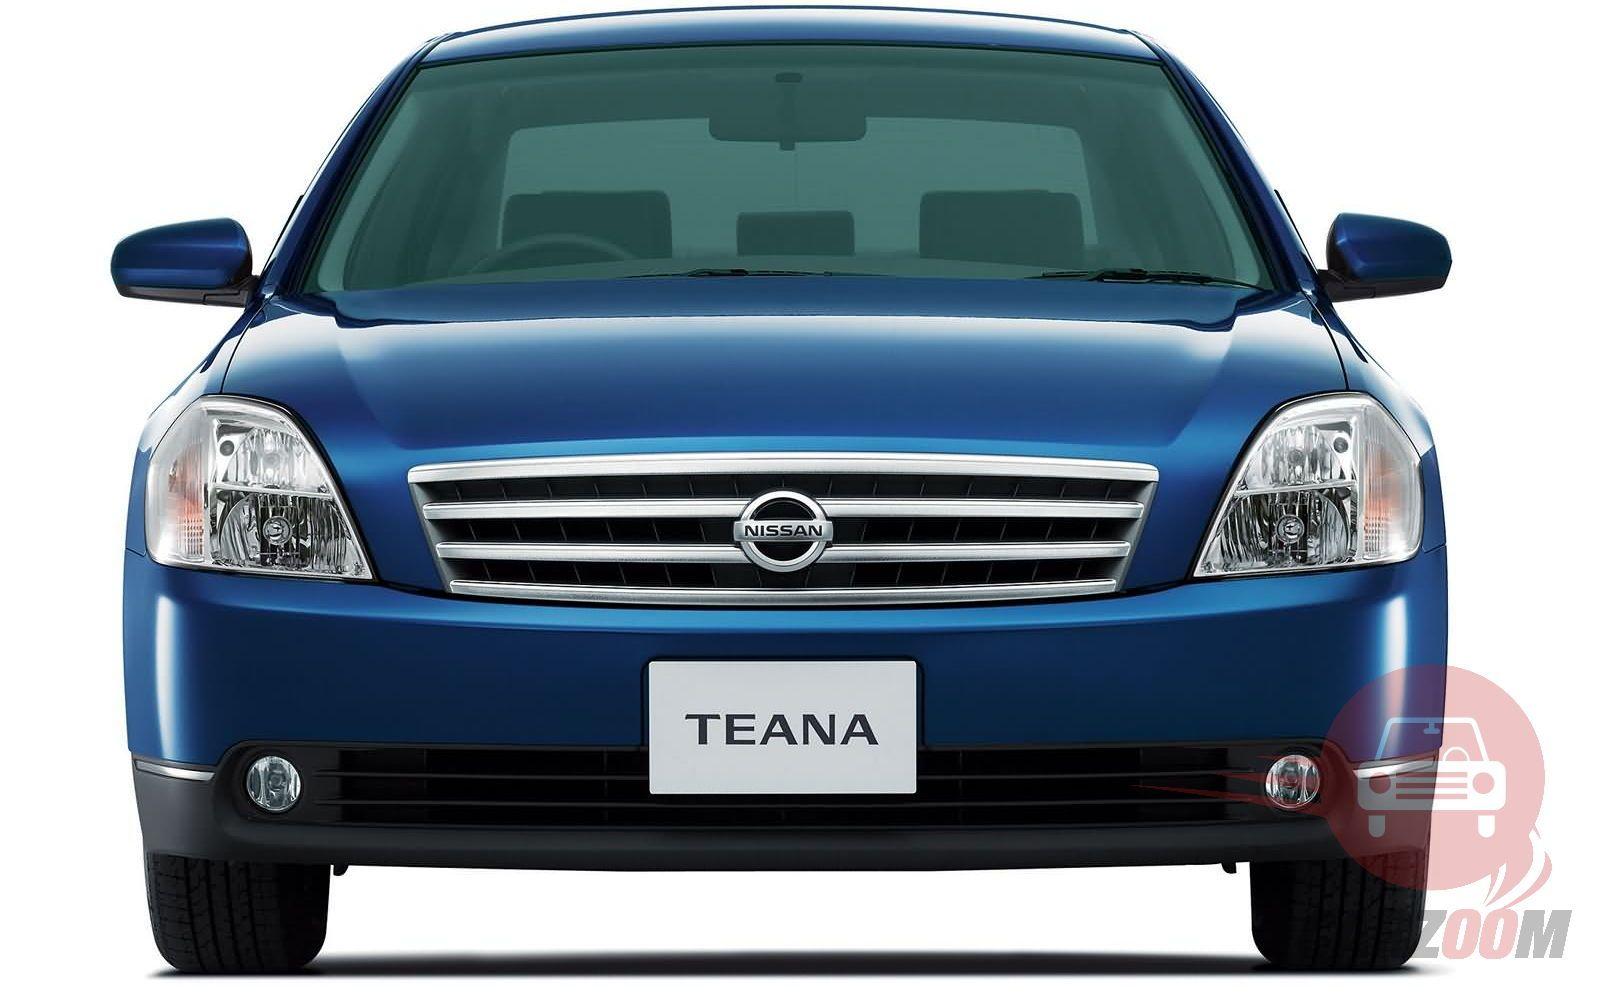 Nissan Teana Exteriors Front View